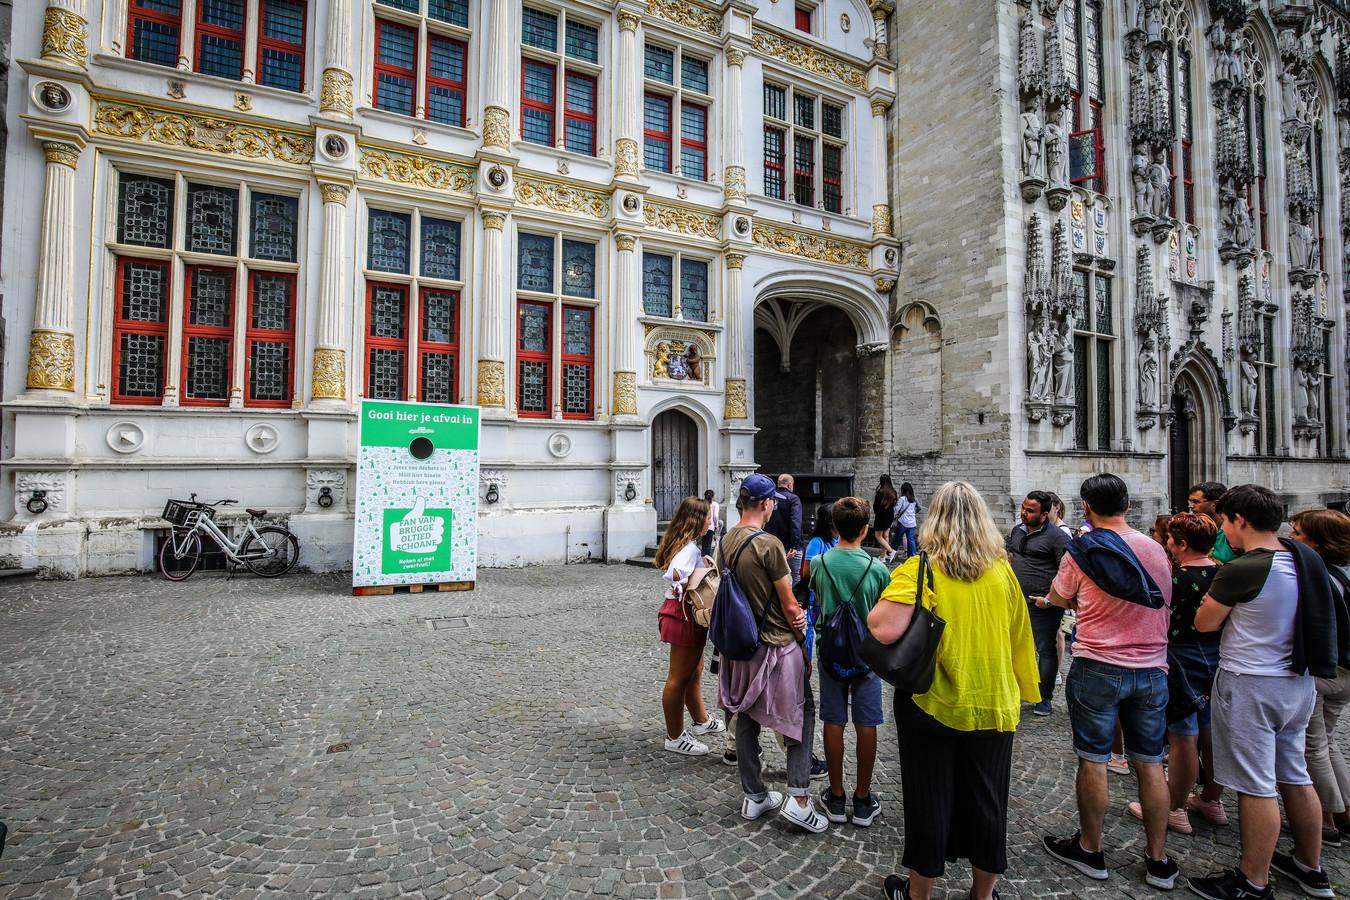 Brugge afvalcontainer voor mooie gevel stadsarchief Brugge